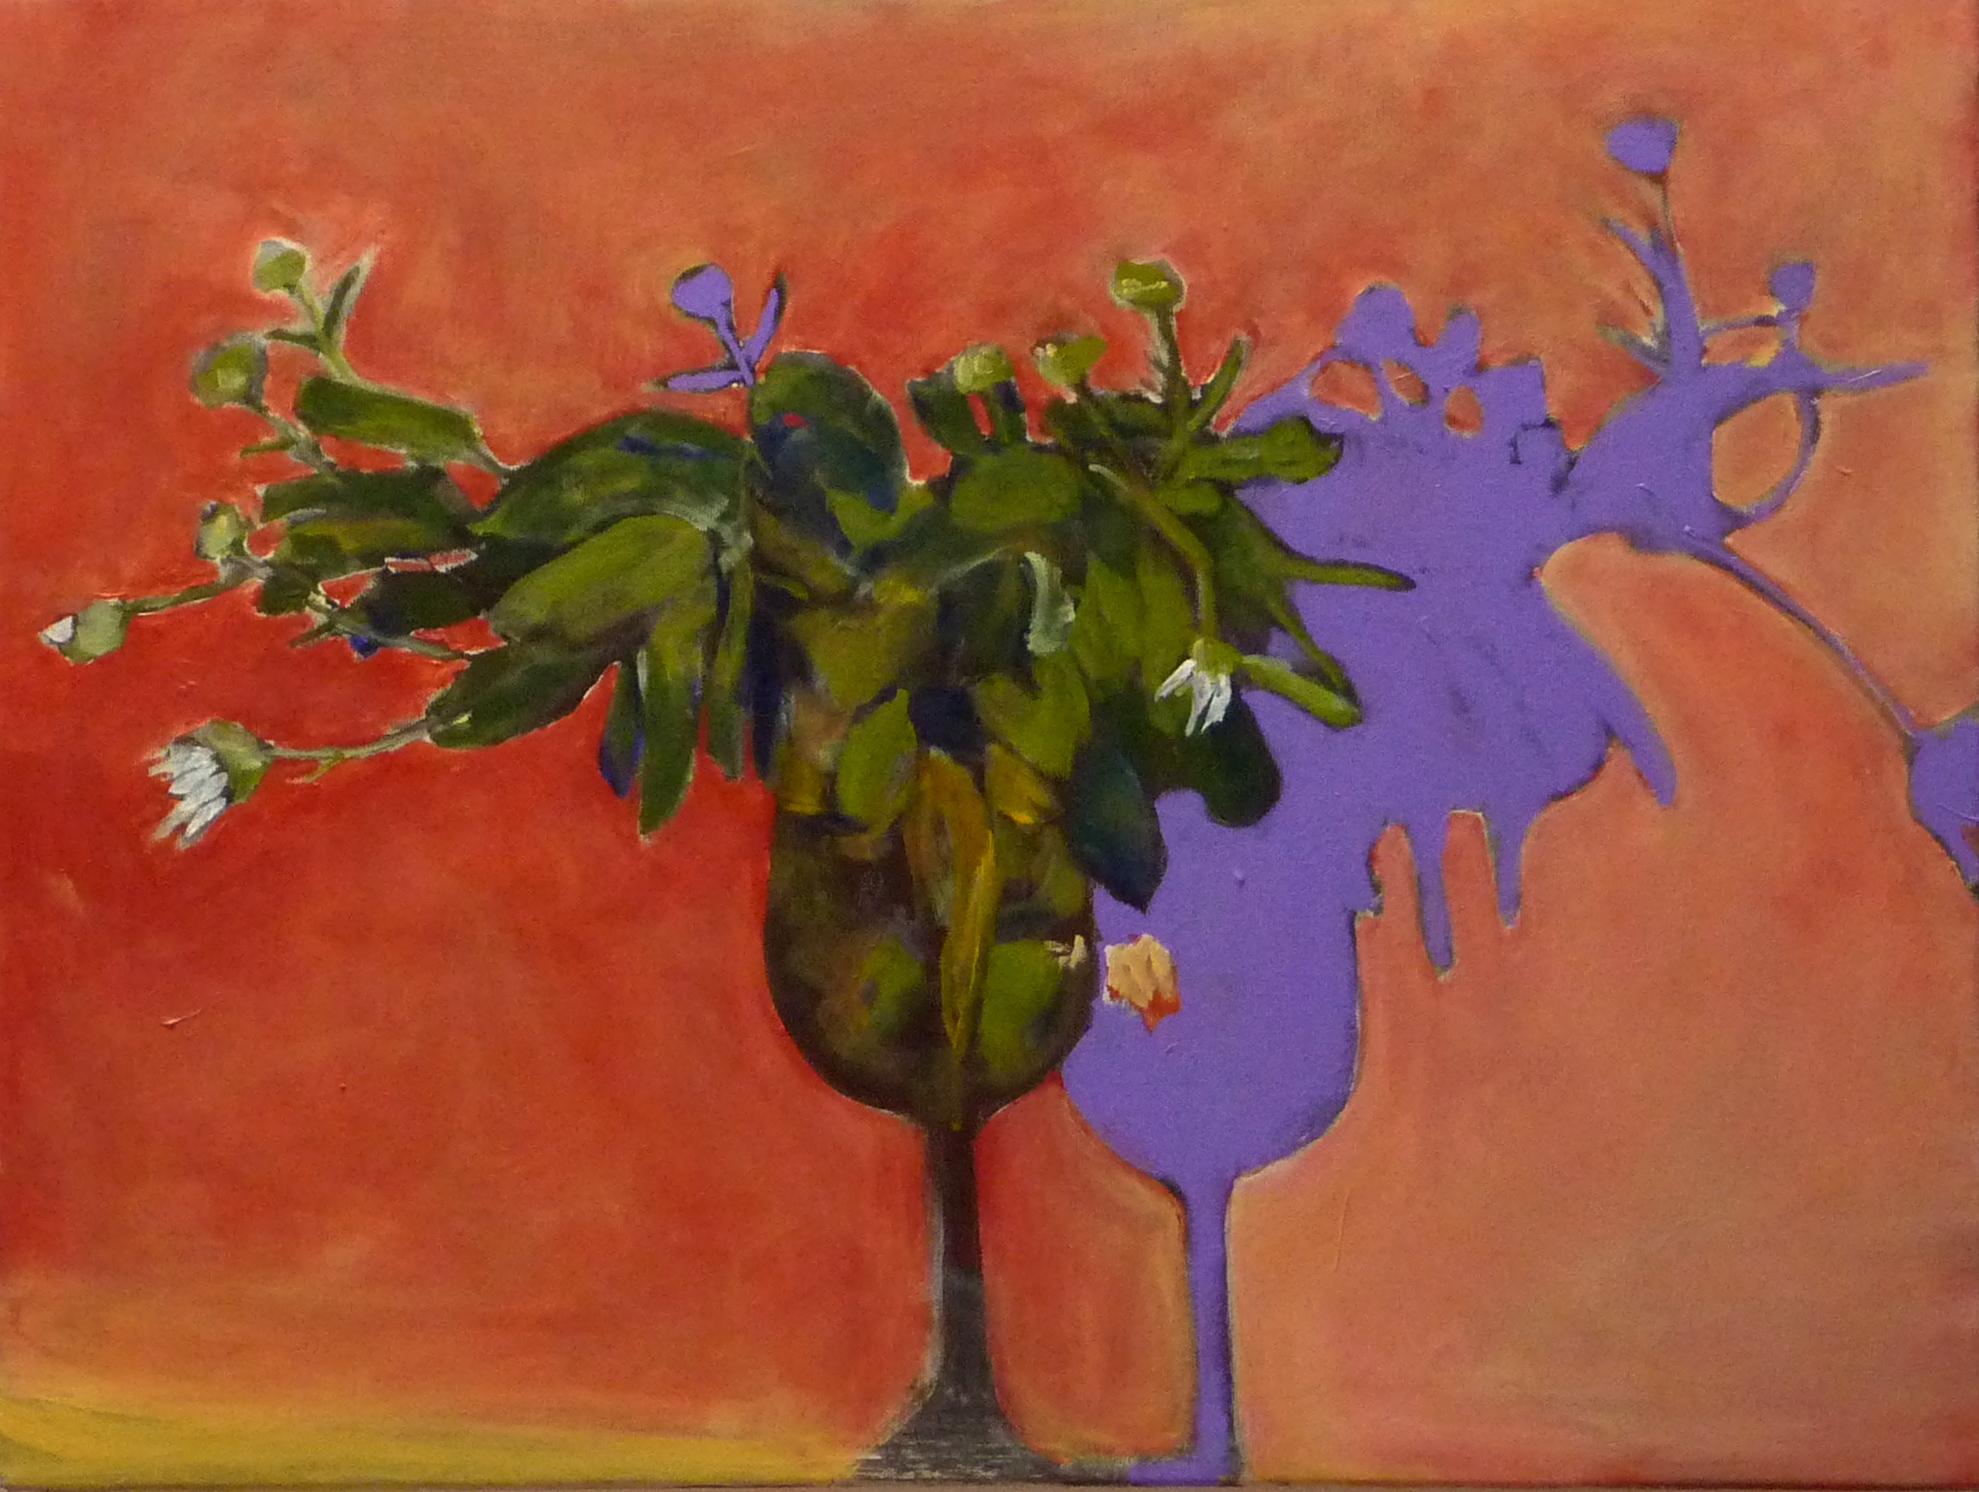 Montauk Bloomin' Sep 29, 2015, 1-41 PM